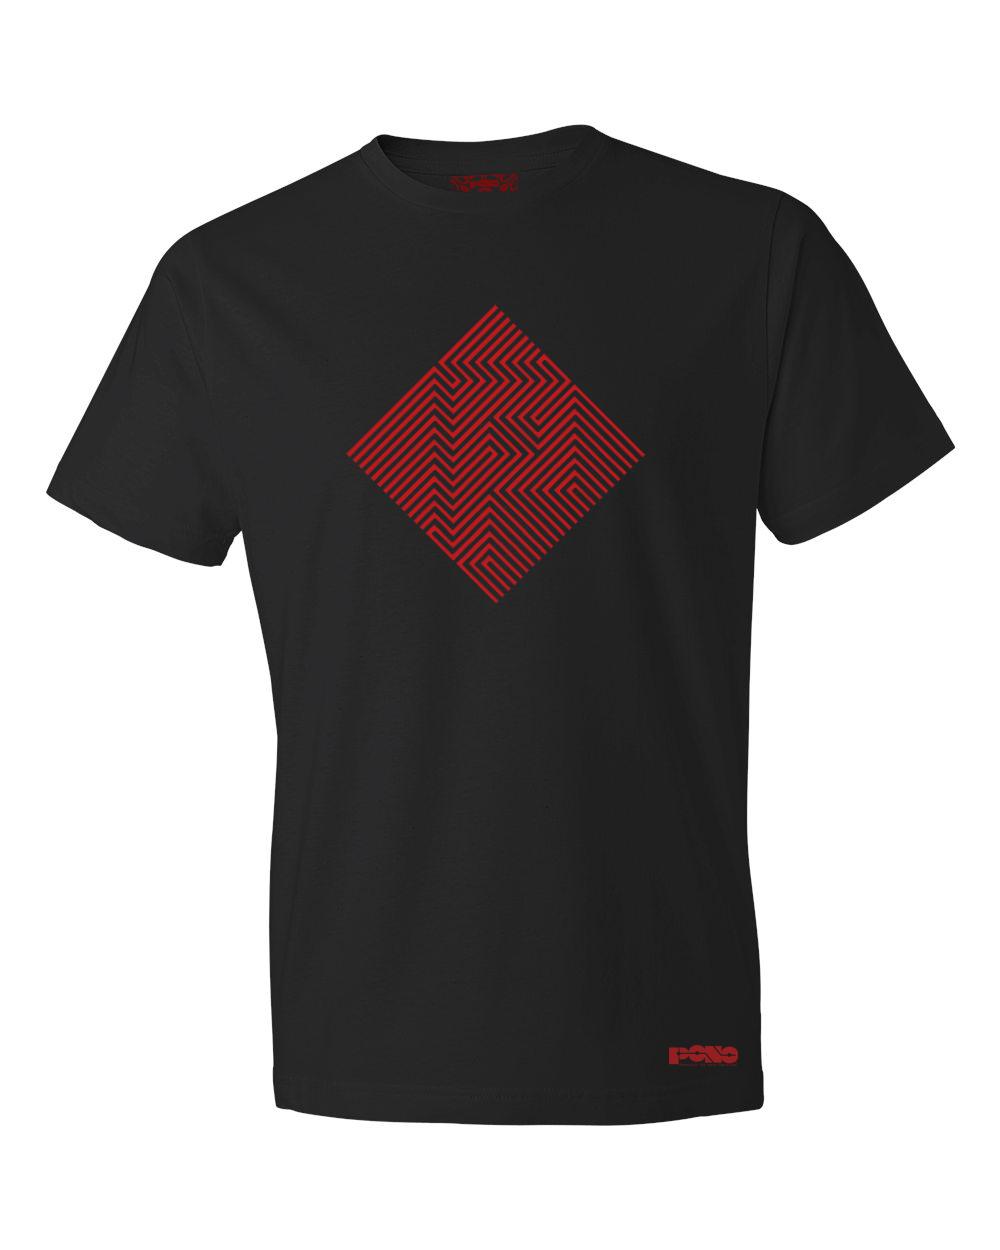 PONO#1-BLACK-geo red#1.jpg